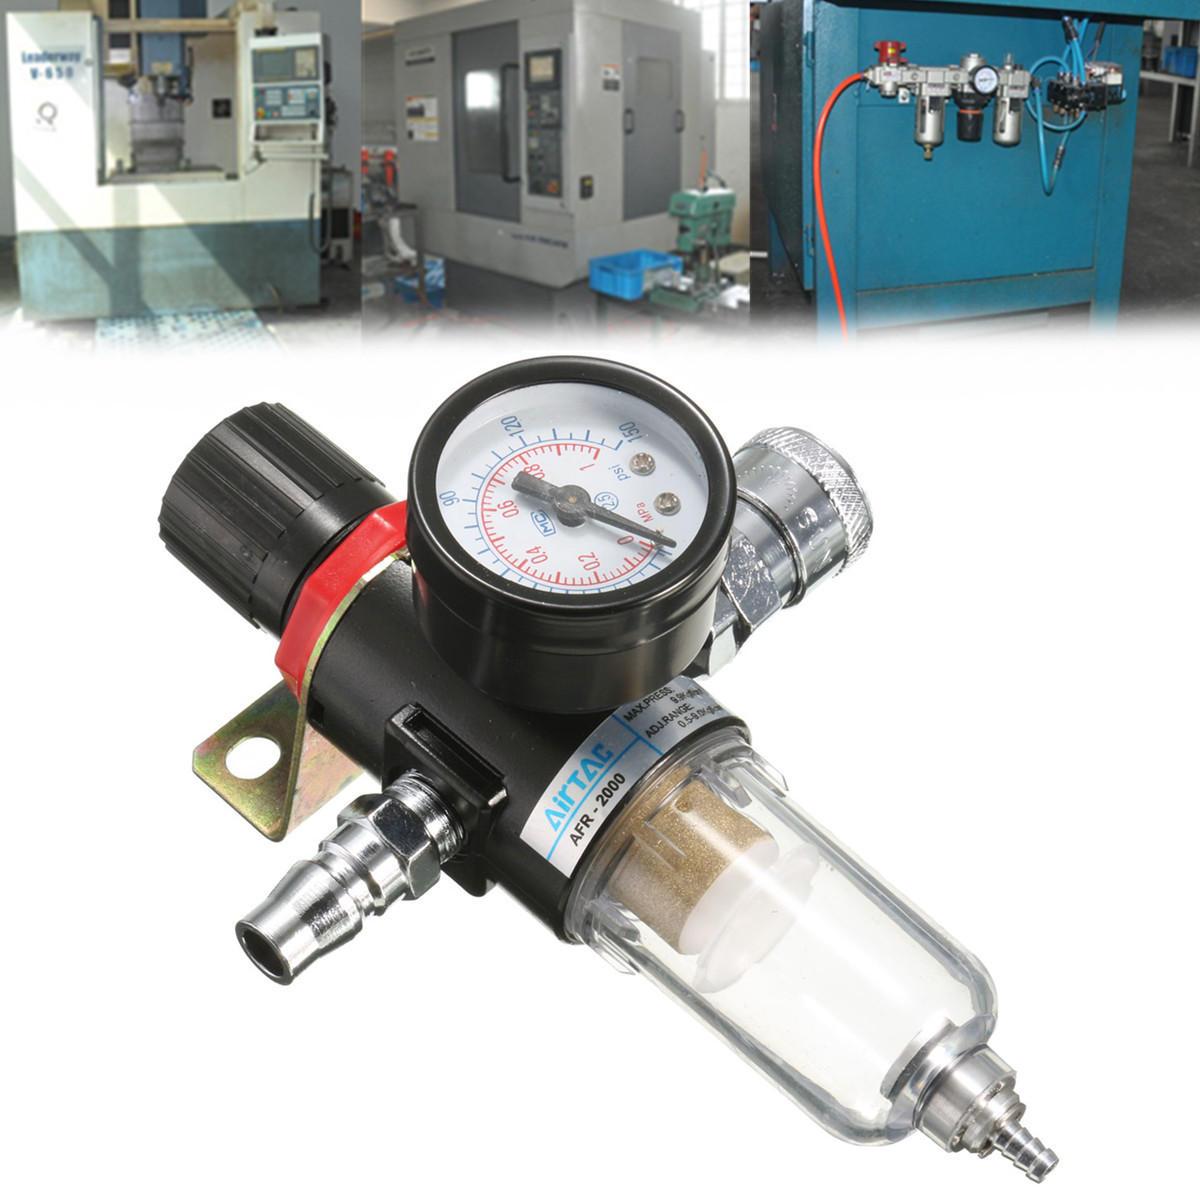 Afr 2000 14 inch air compressor filter water separator trap tools afr 2000 14 air compressor filter water separator trap tools kit regulator fandeluxe Images